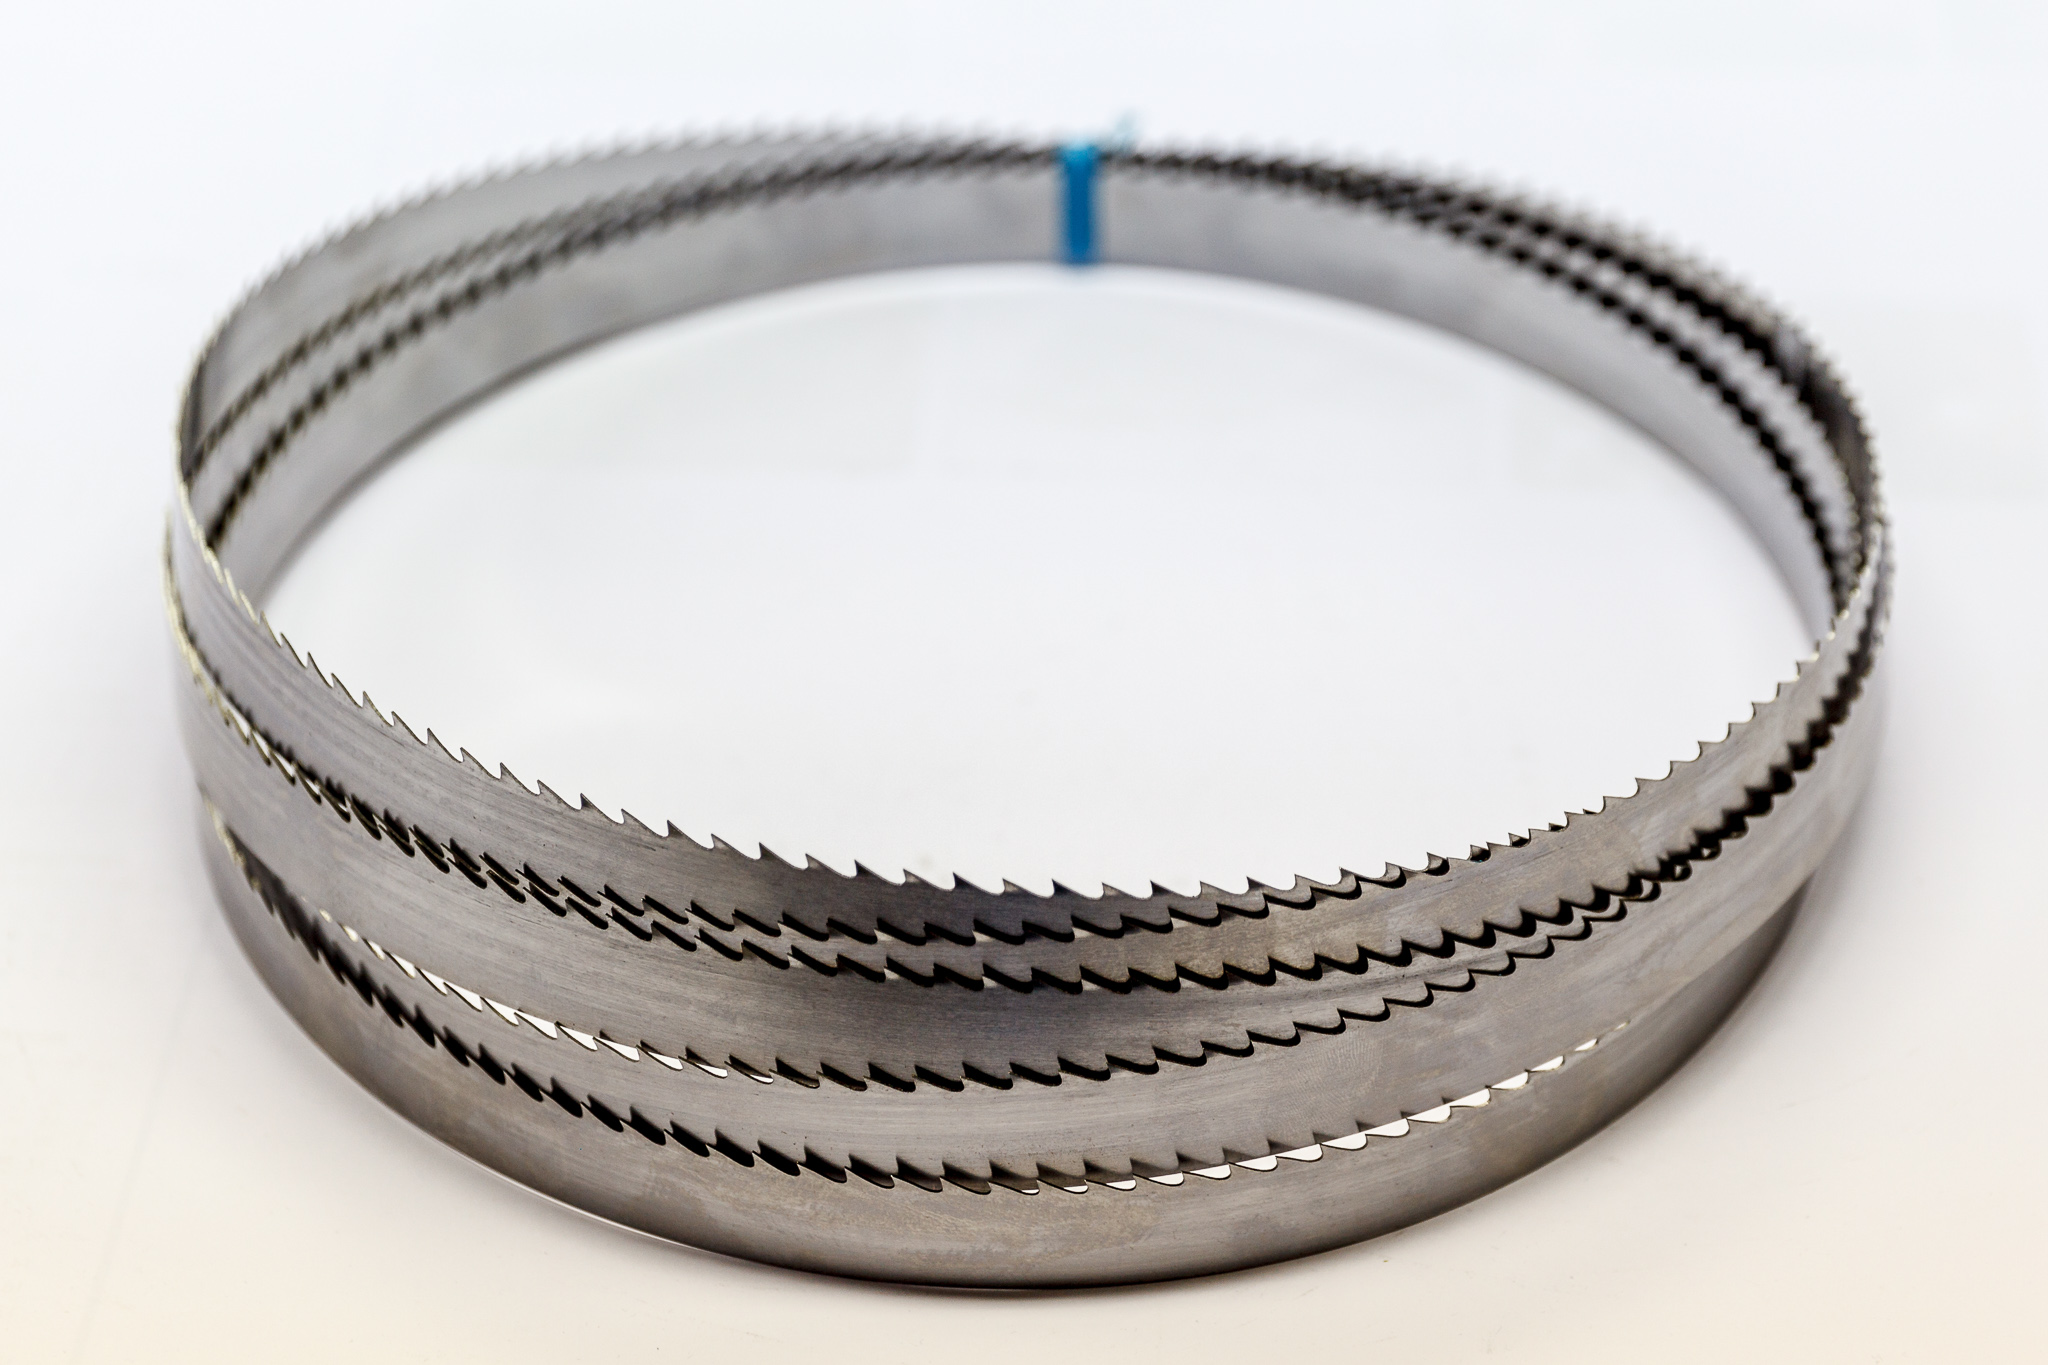 Bands/ägeblatt 3 x SBM Uddeholm Holzs/ägeband 2240 x 15 x 0,6 mm mit 3 mm Zahnabstand